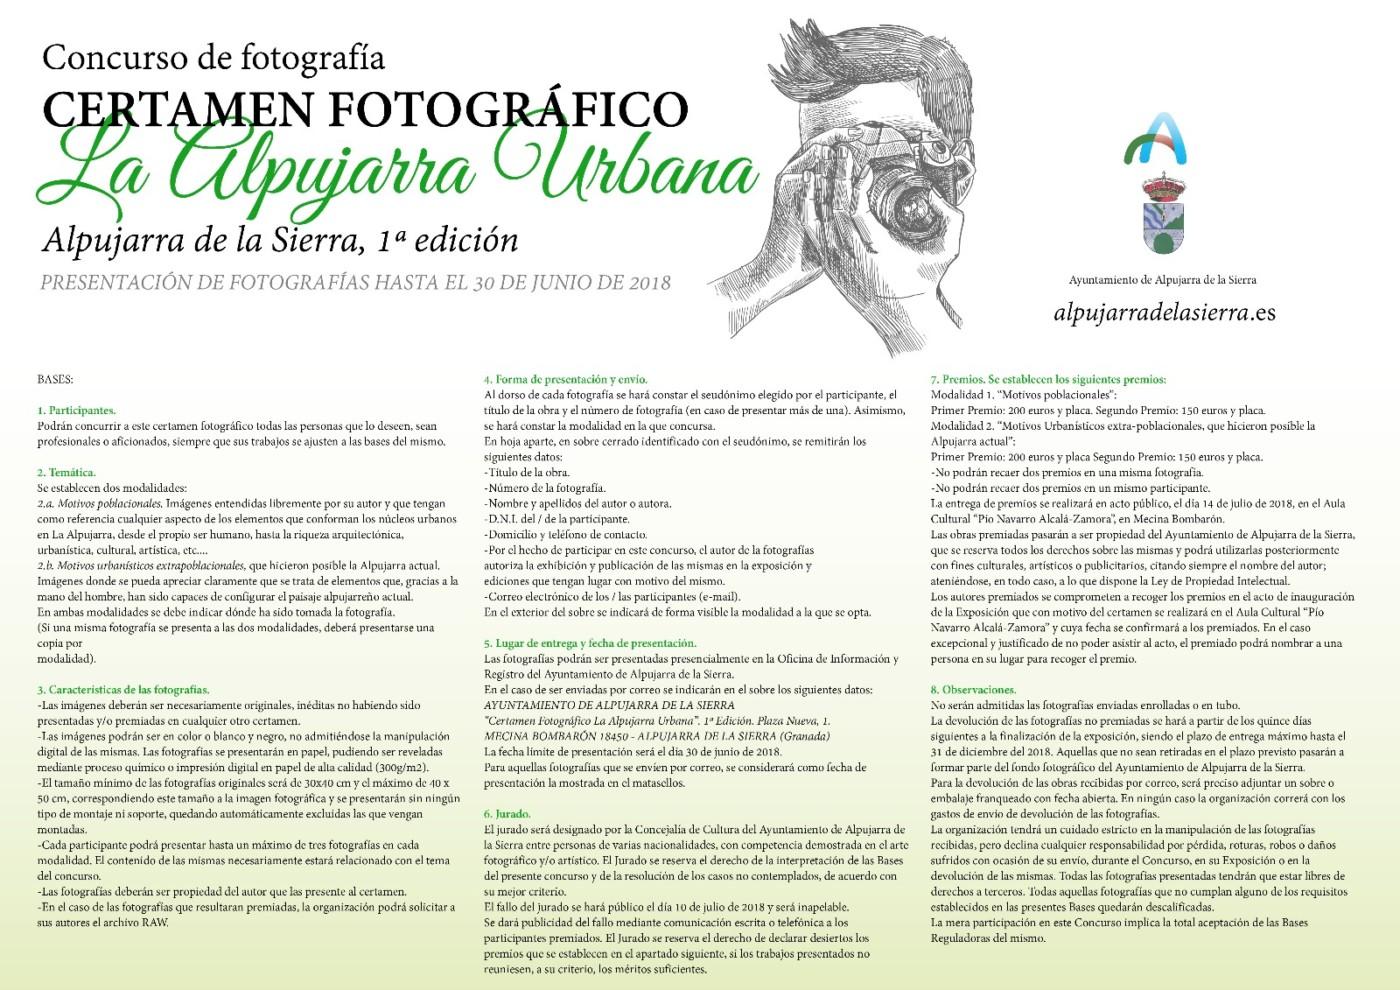 1ª Edicion Concurso de Fotografia en Alpujarra de la Sierra